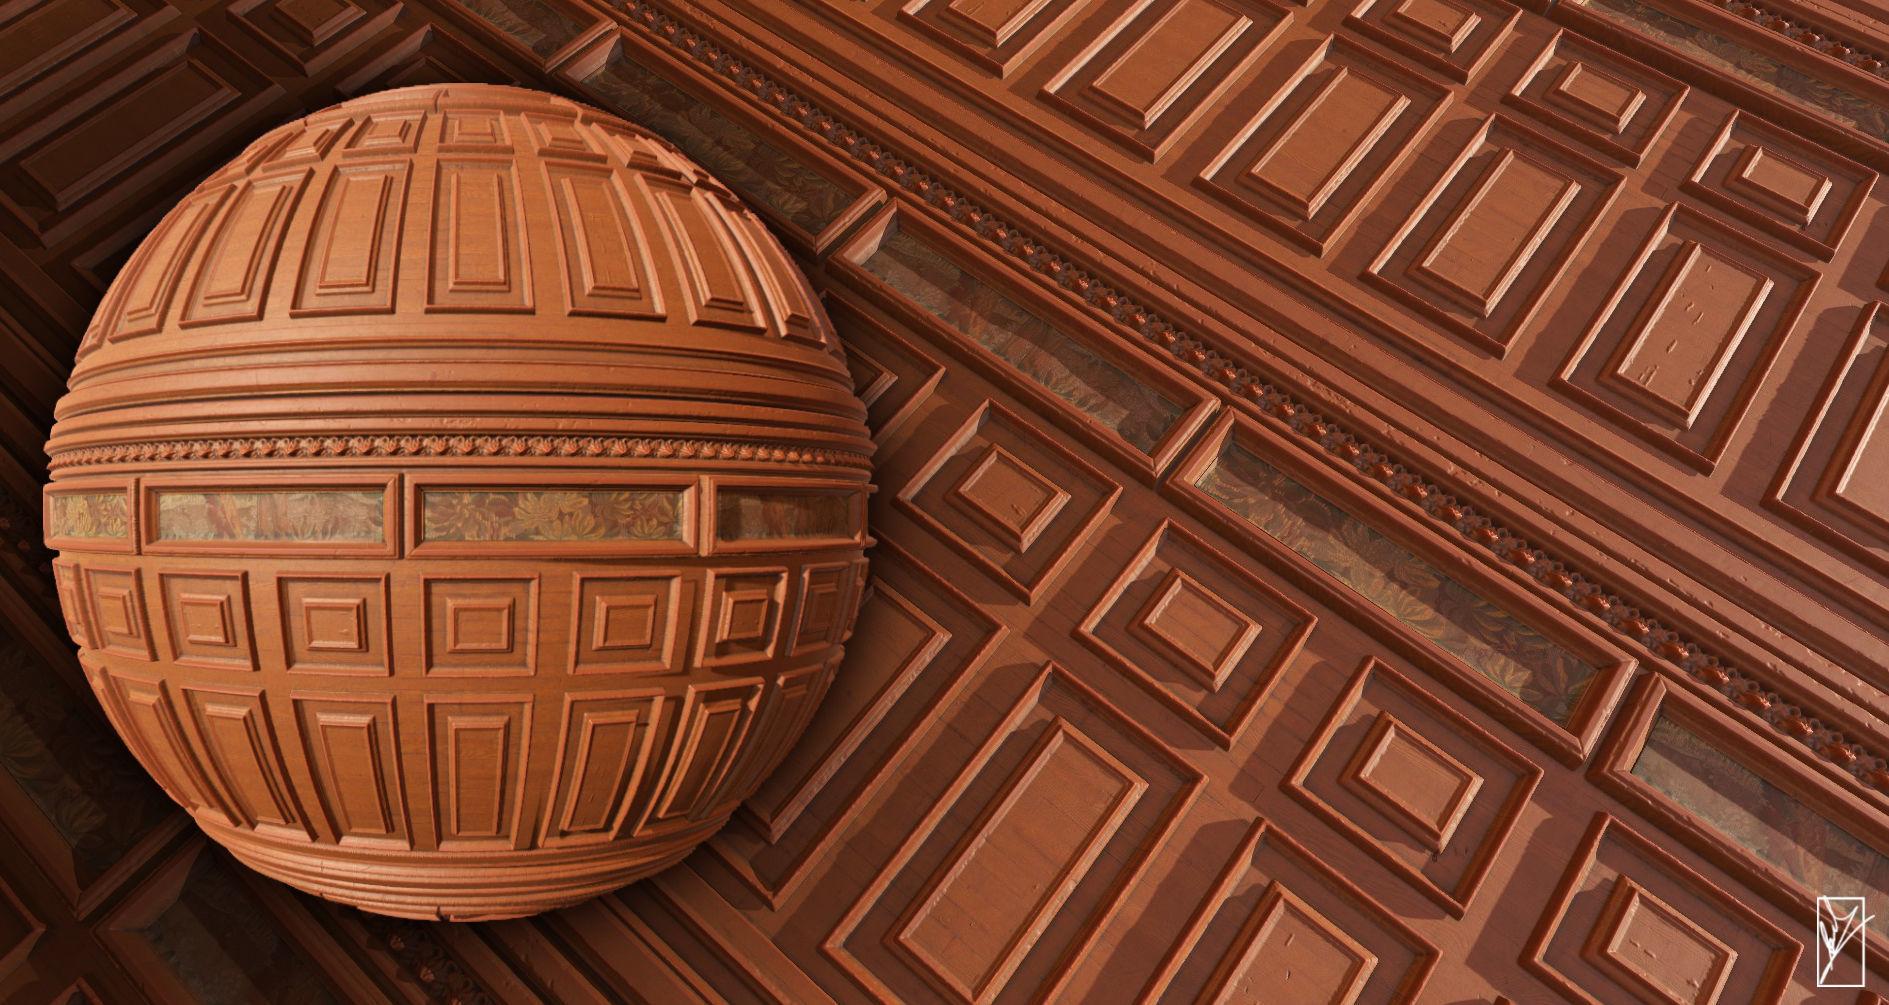 Wooden wall - PBR textures